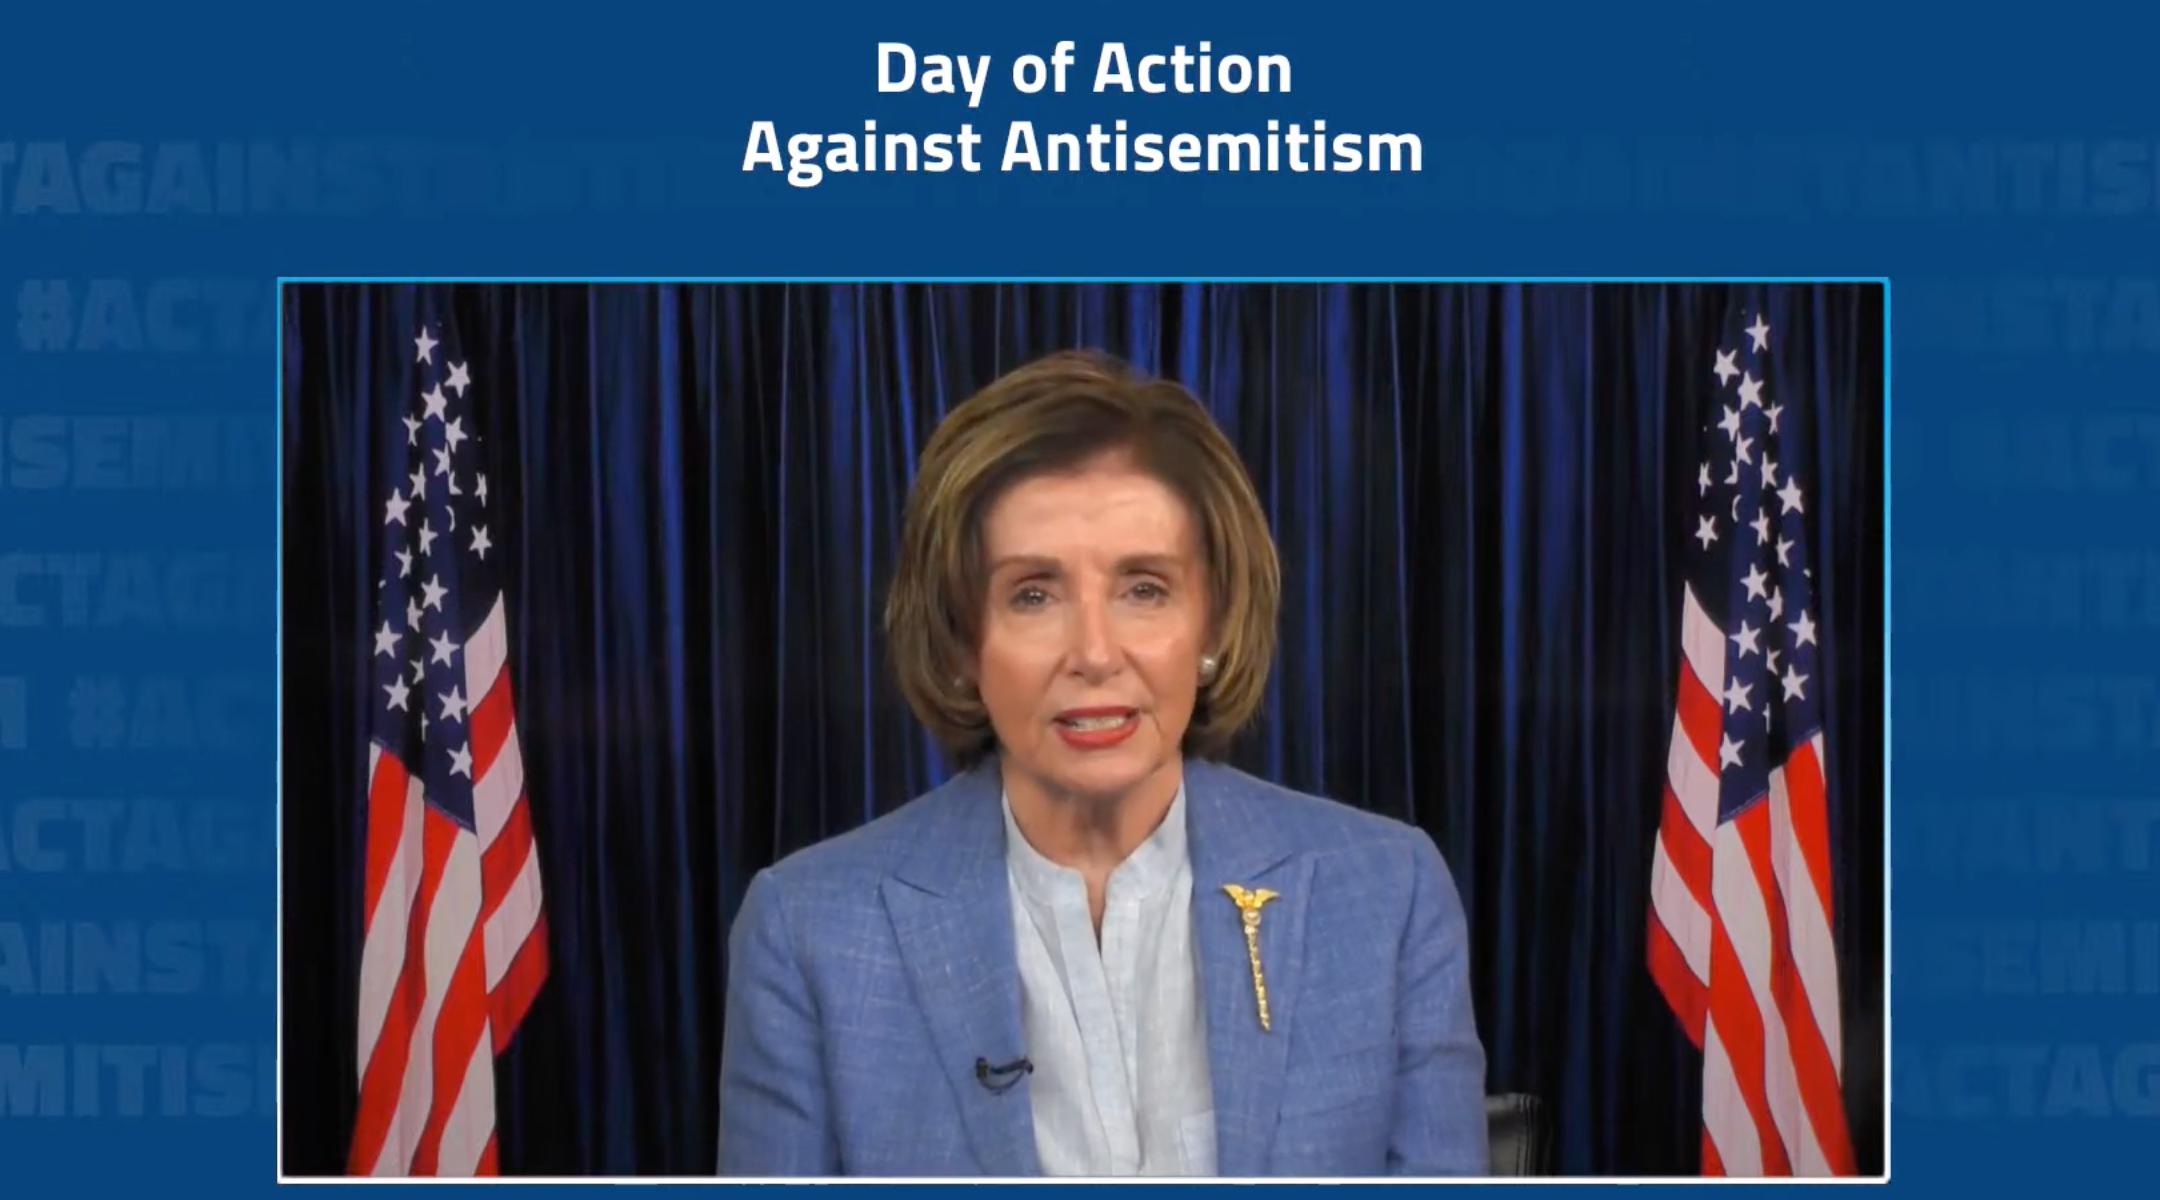 House Speaker Nancy Pelosi speaks at a virtual rally to combat antisemitism on May 27, 2021. (Screenshot)